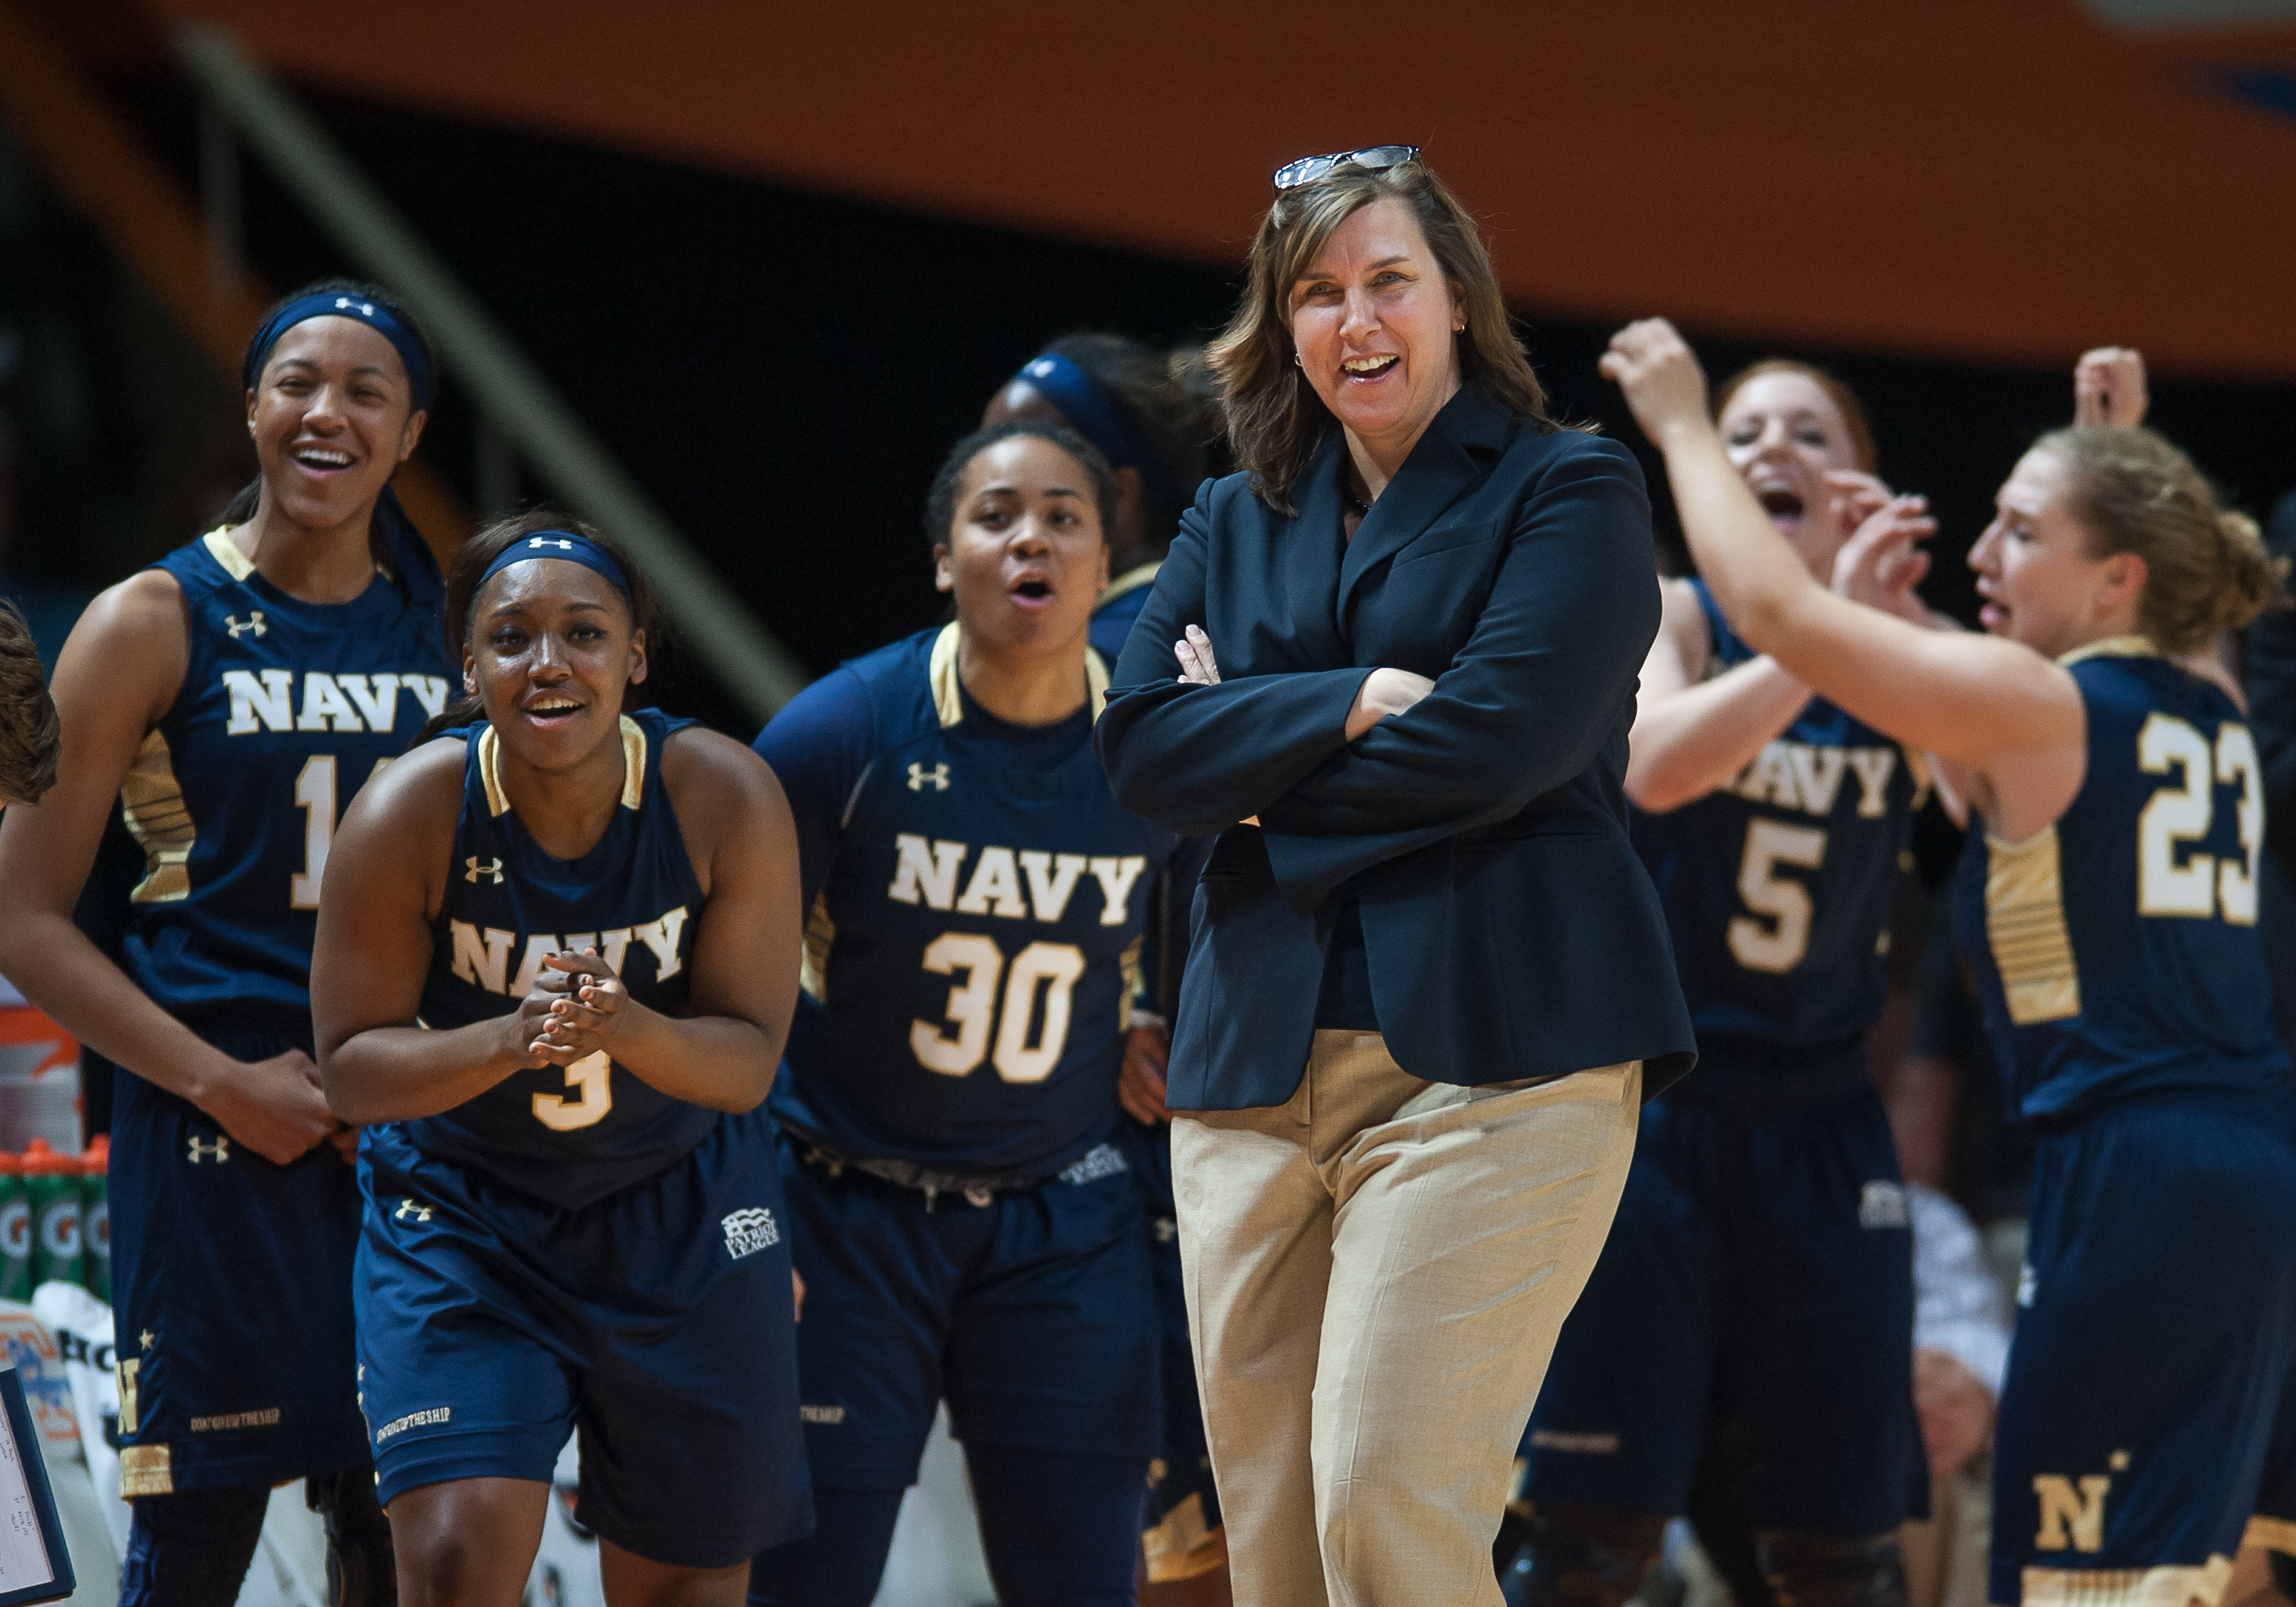 NCAA BASKETBALL: NOV 13 Women's - Navy at Tennessee (2016)